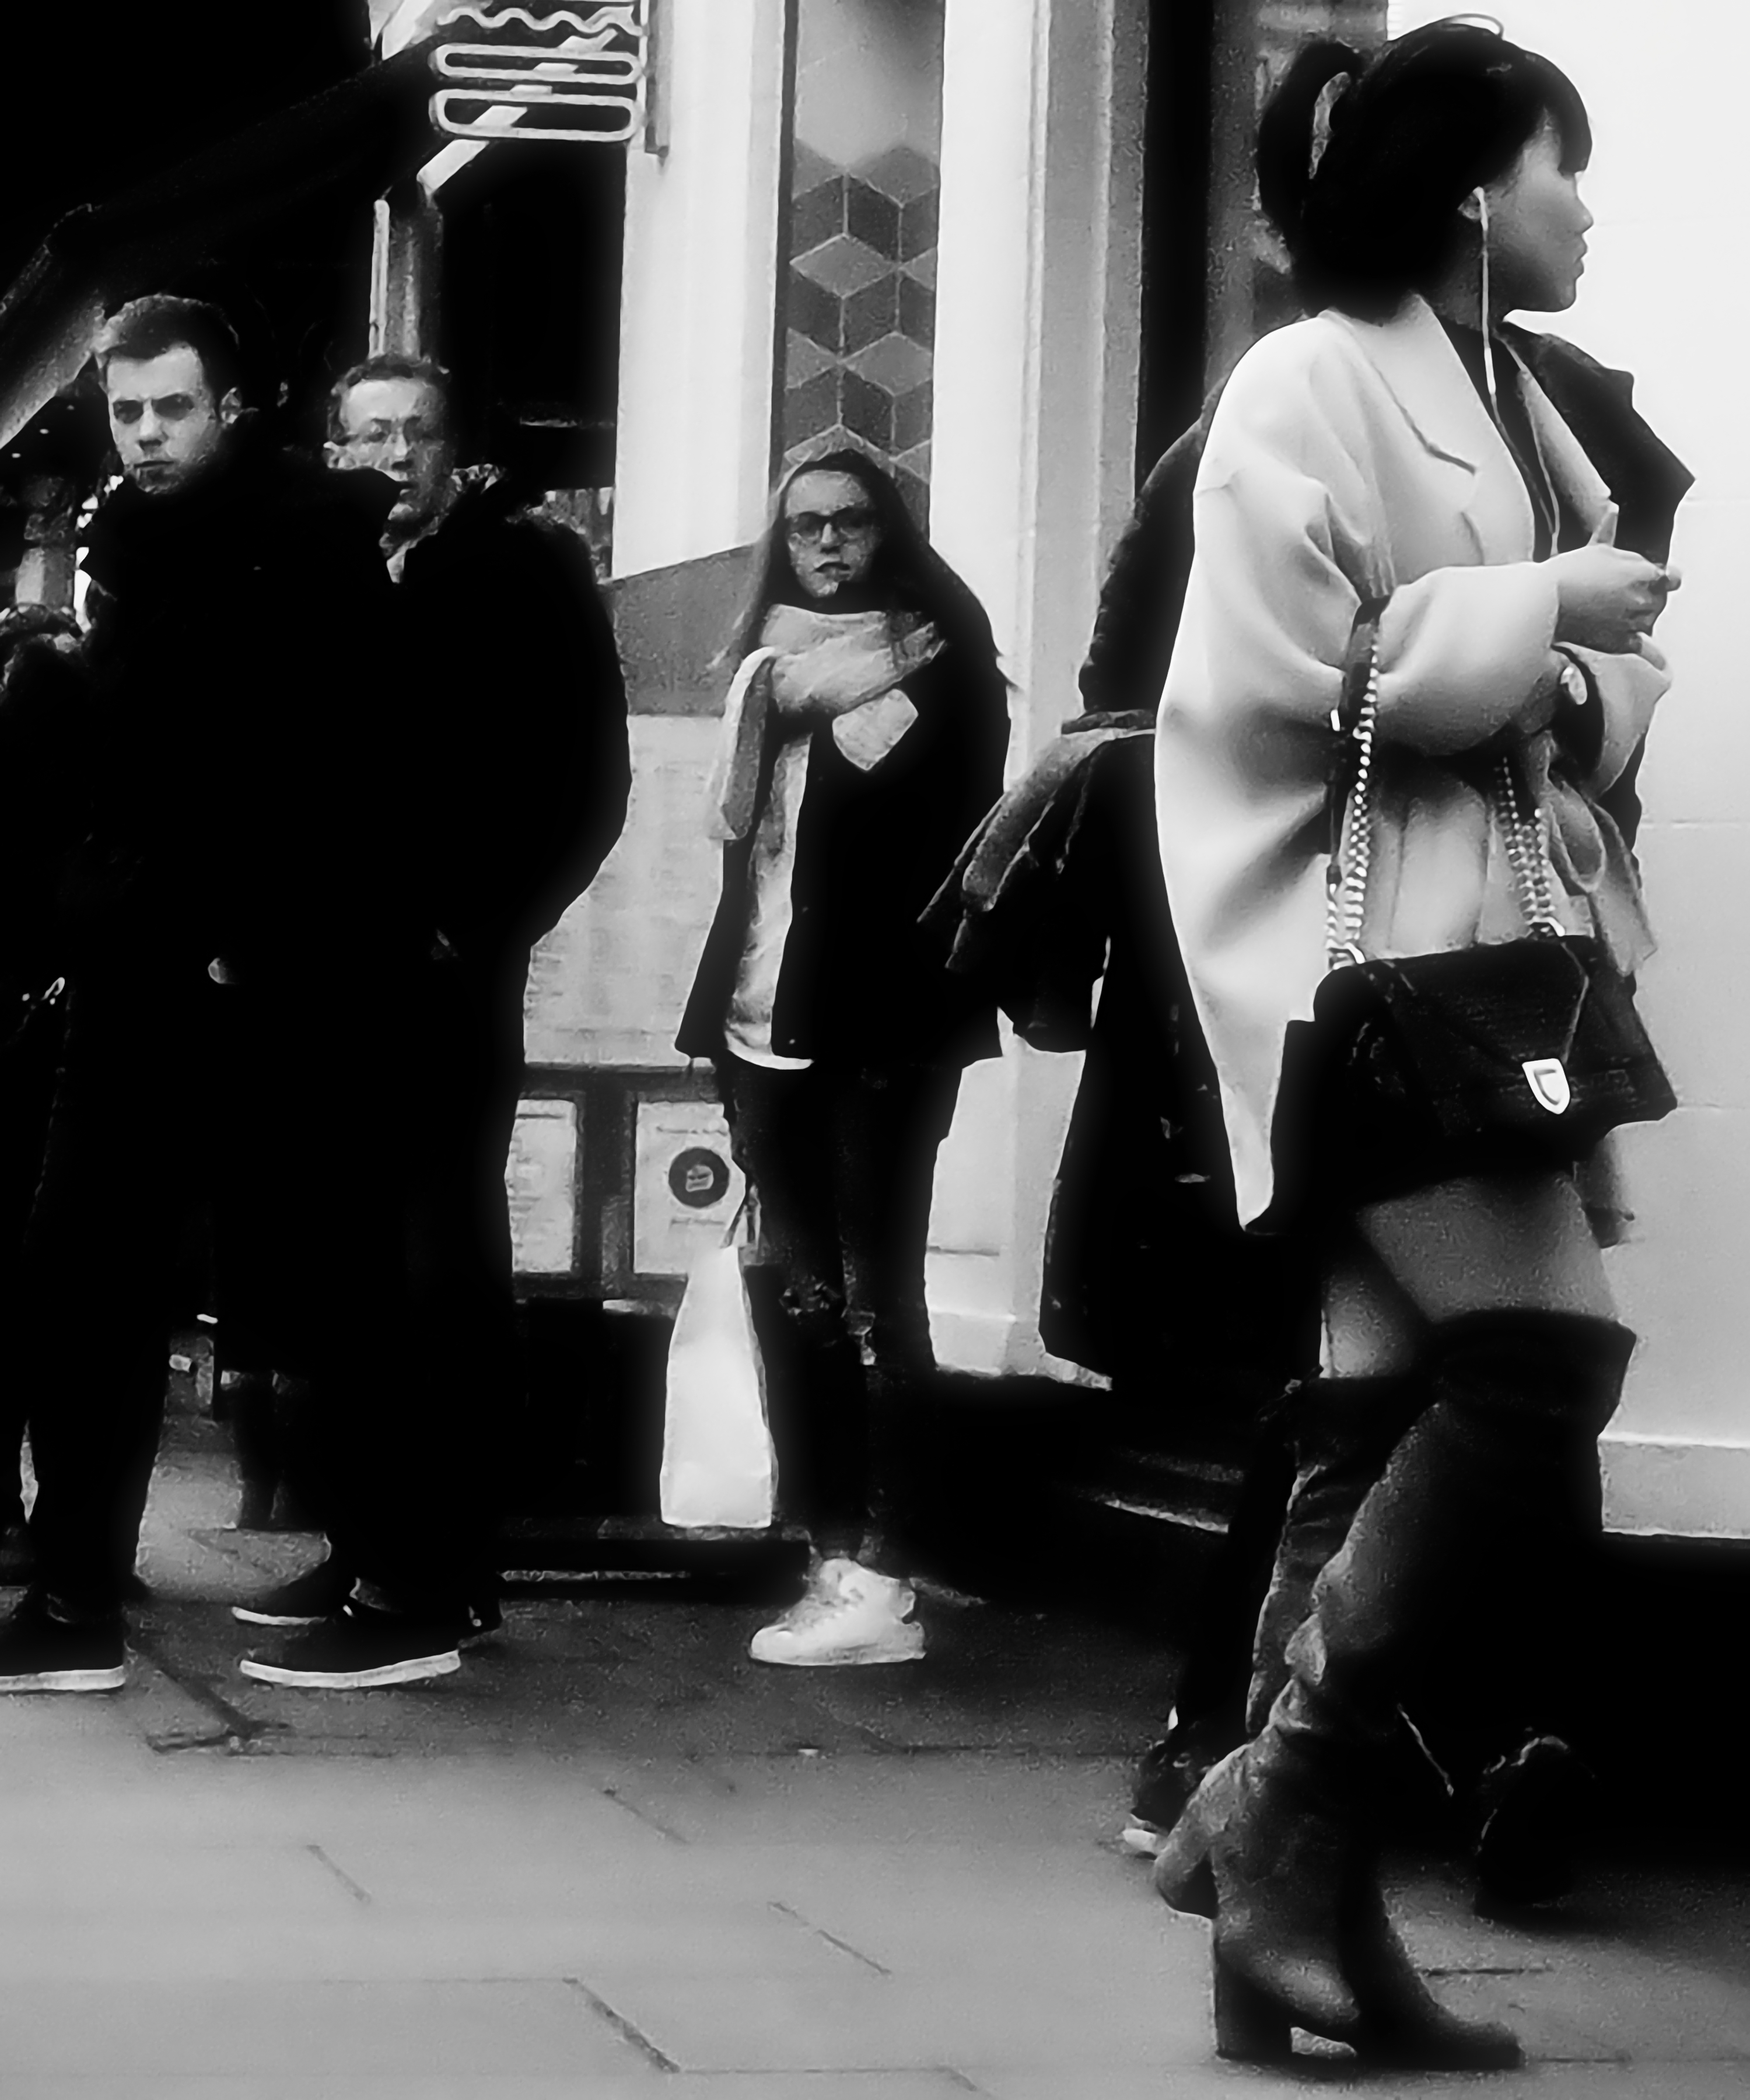 Shaftesbury Ave, London, Feb 2017